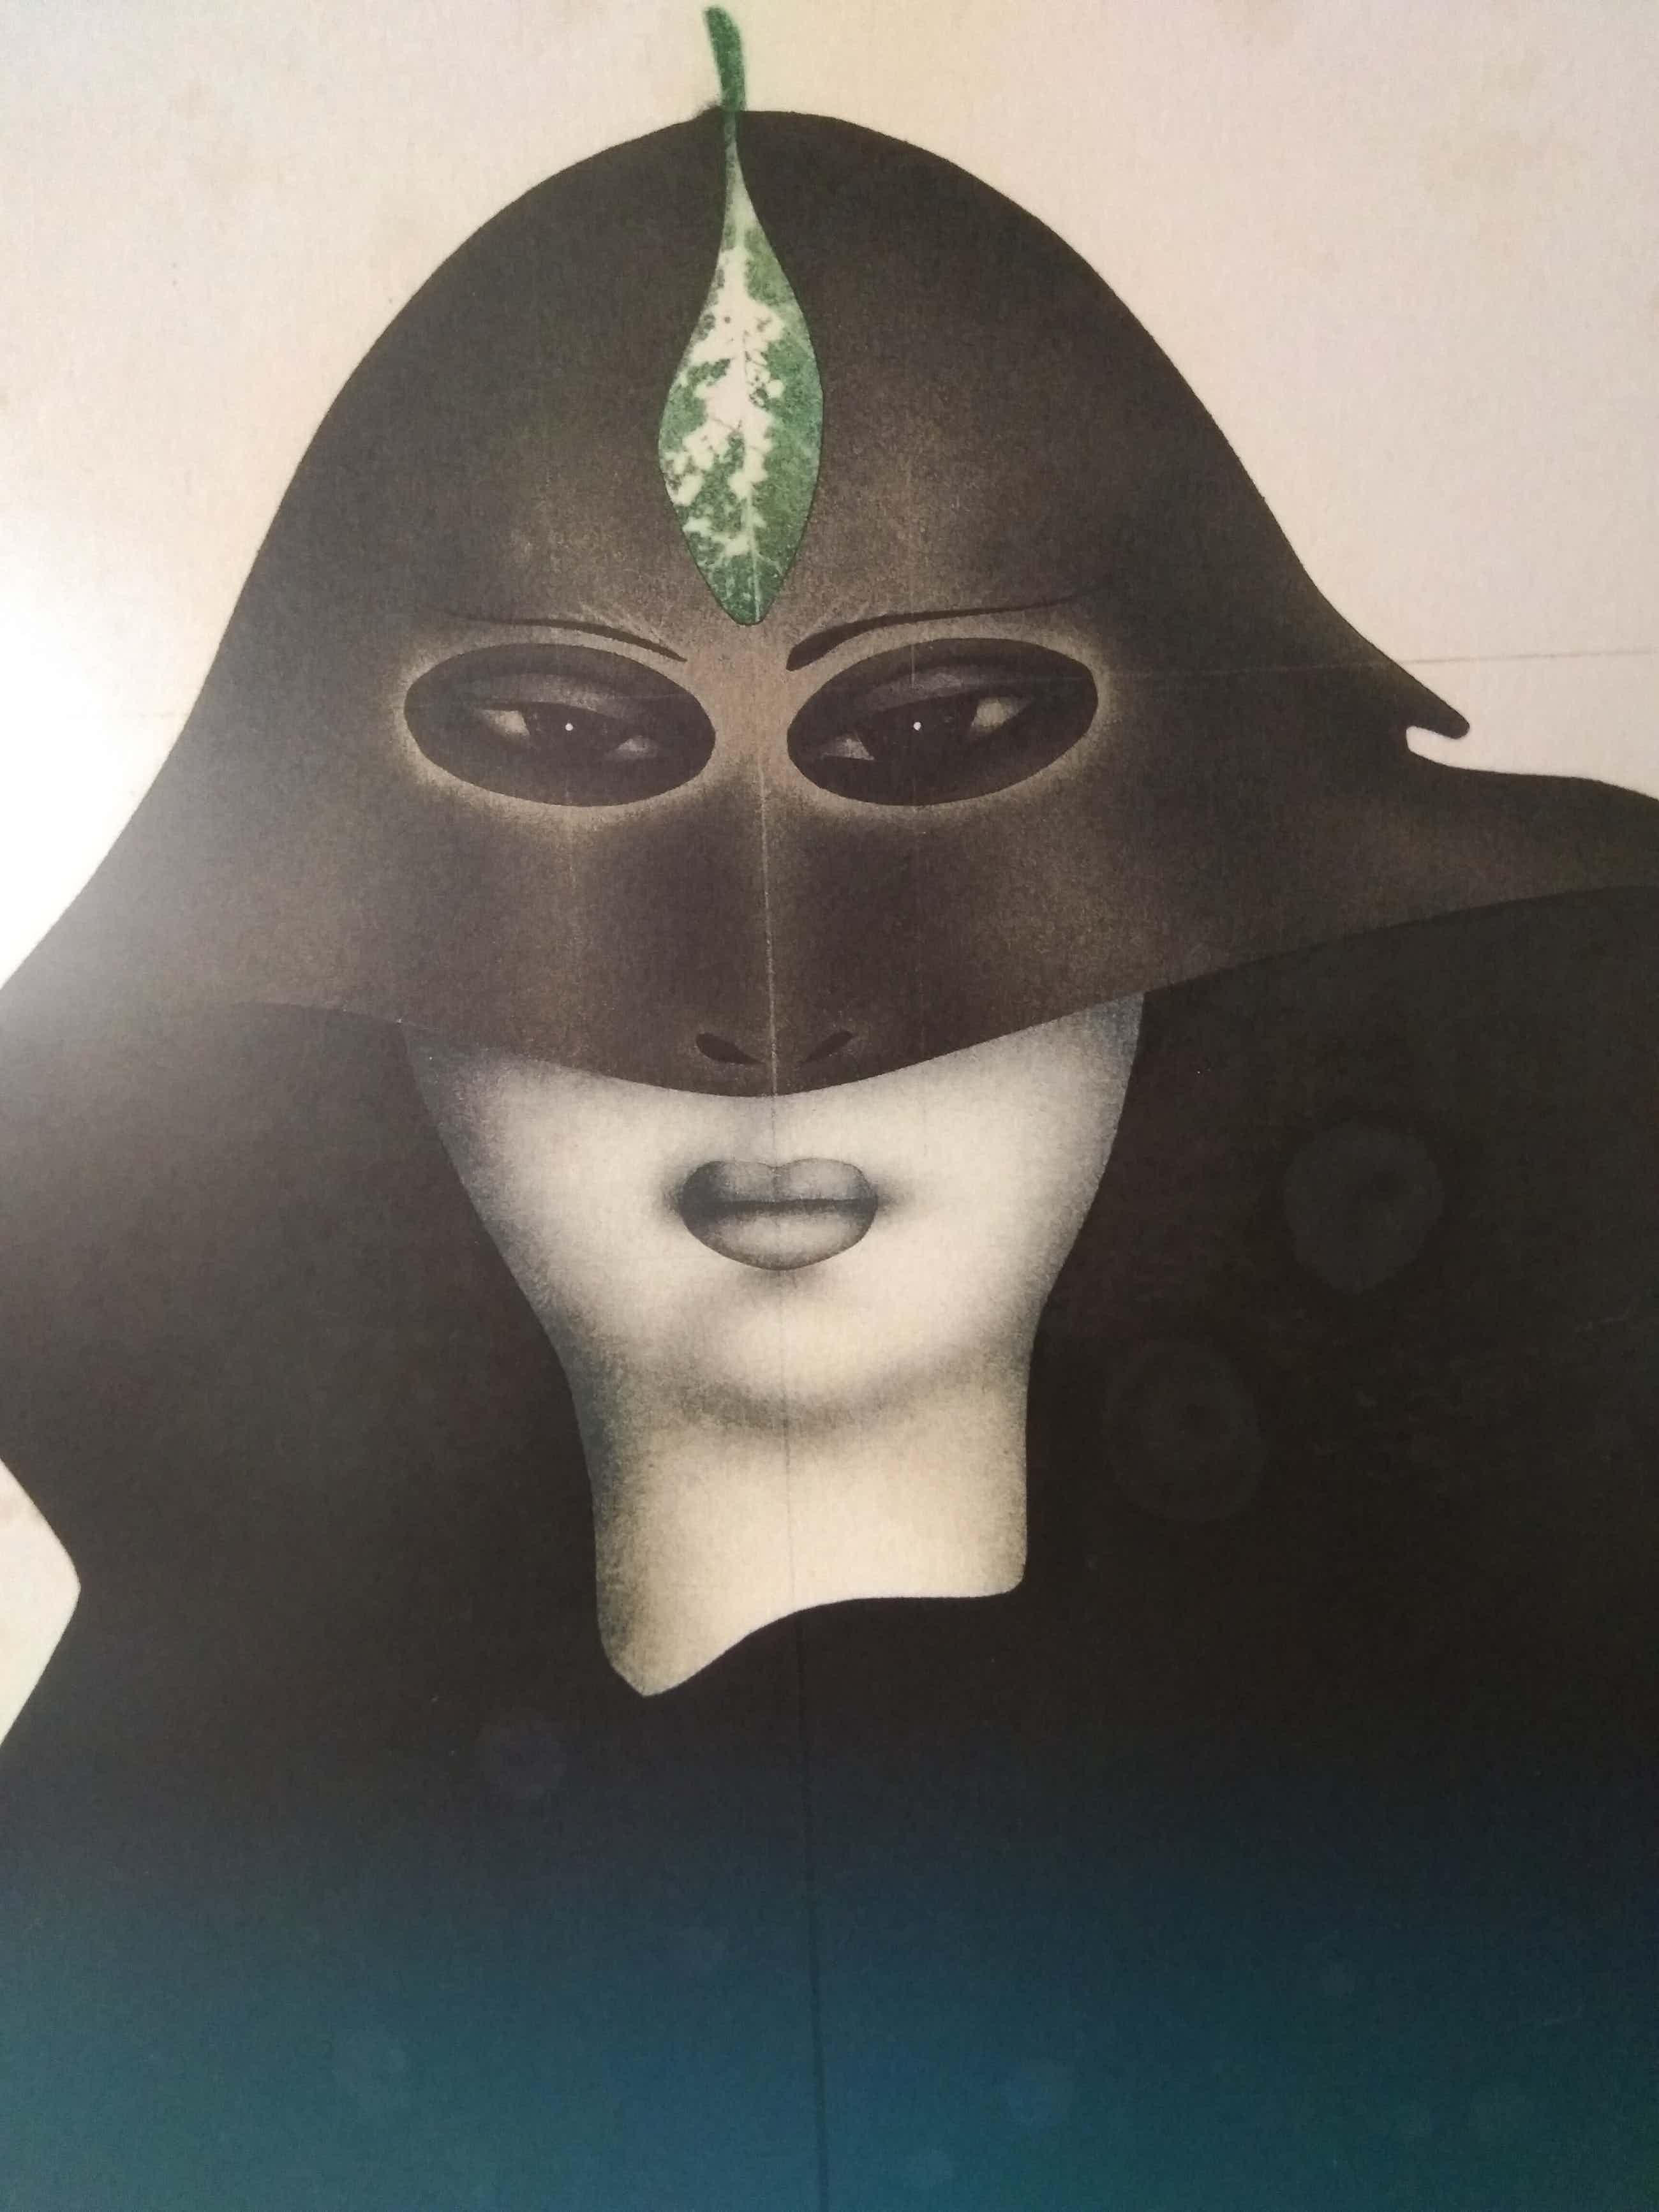 Paul Wunderlich - Têtes des Femmes (serie van 3, Beatrice, Diane, Héloïse) kopen? Bied vanaf 40!